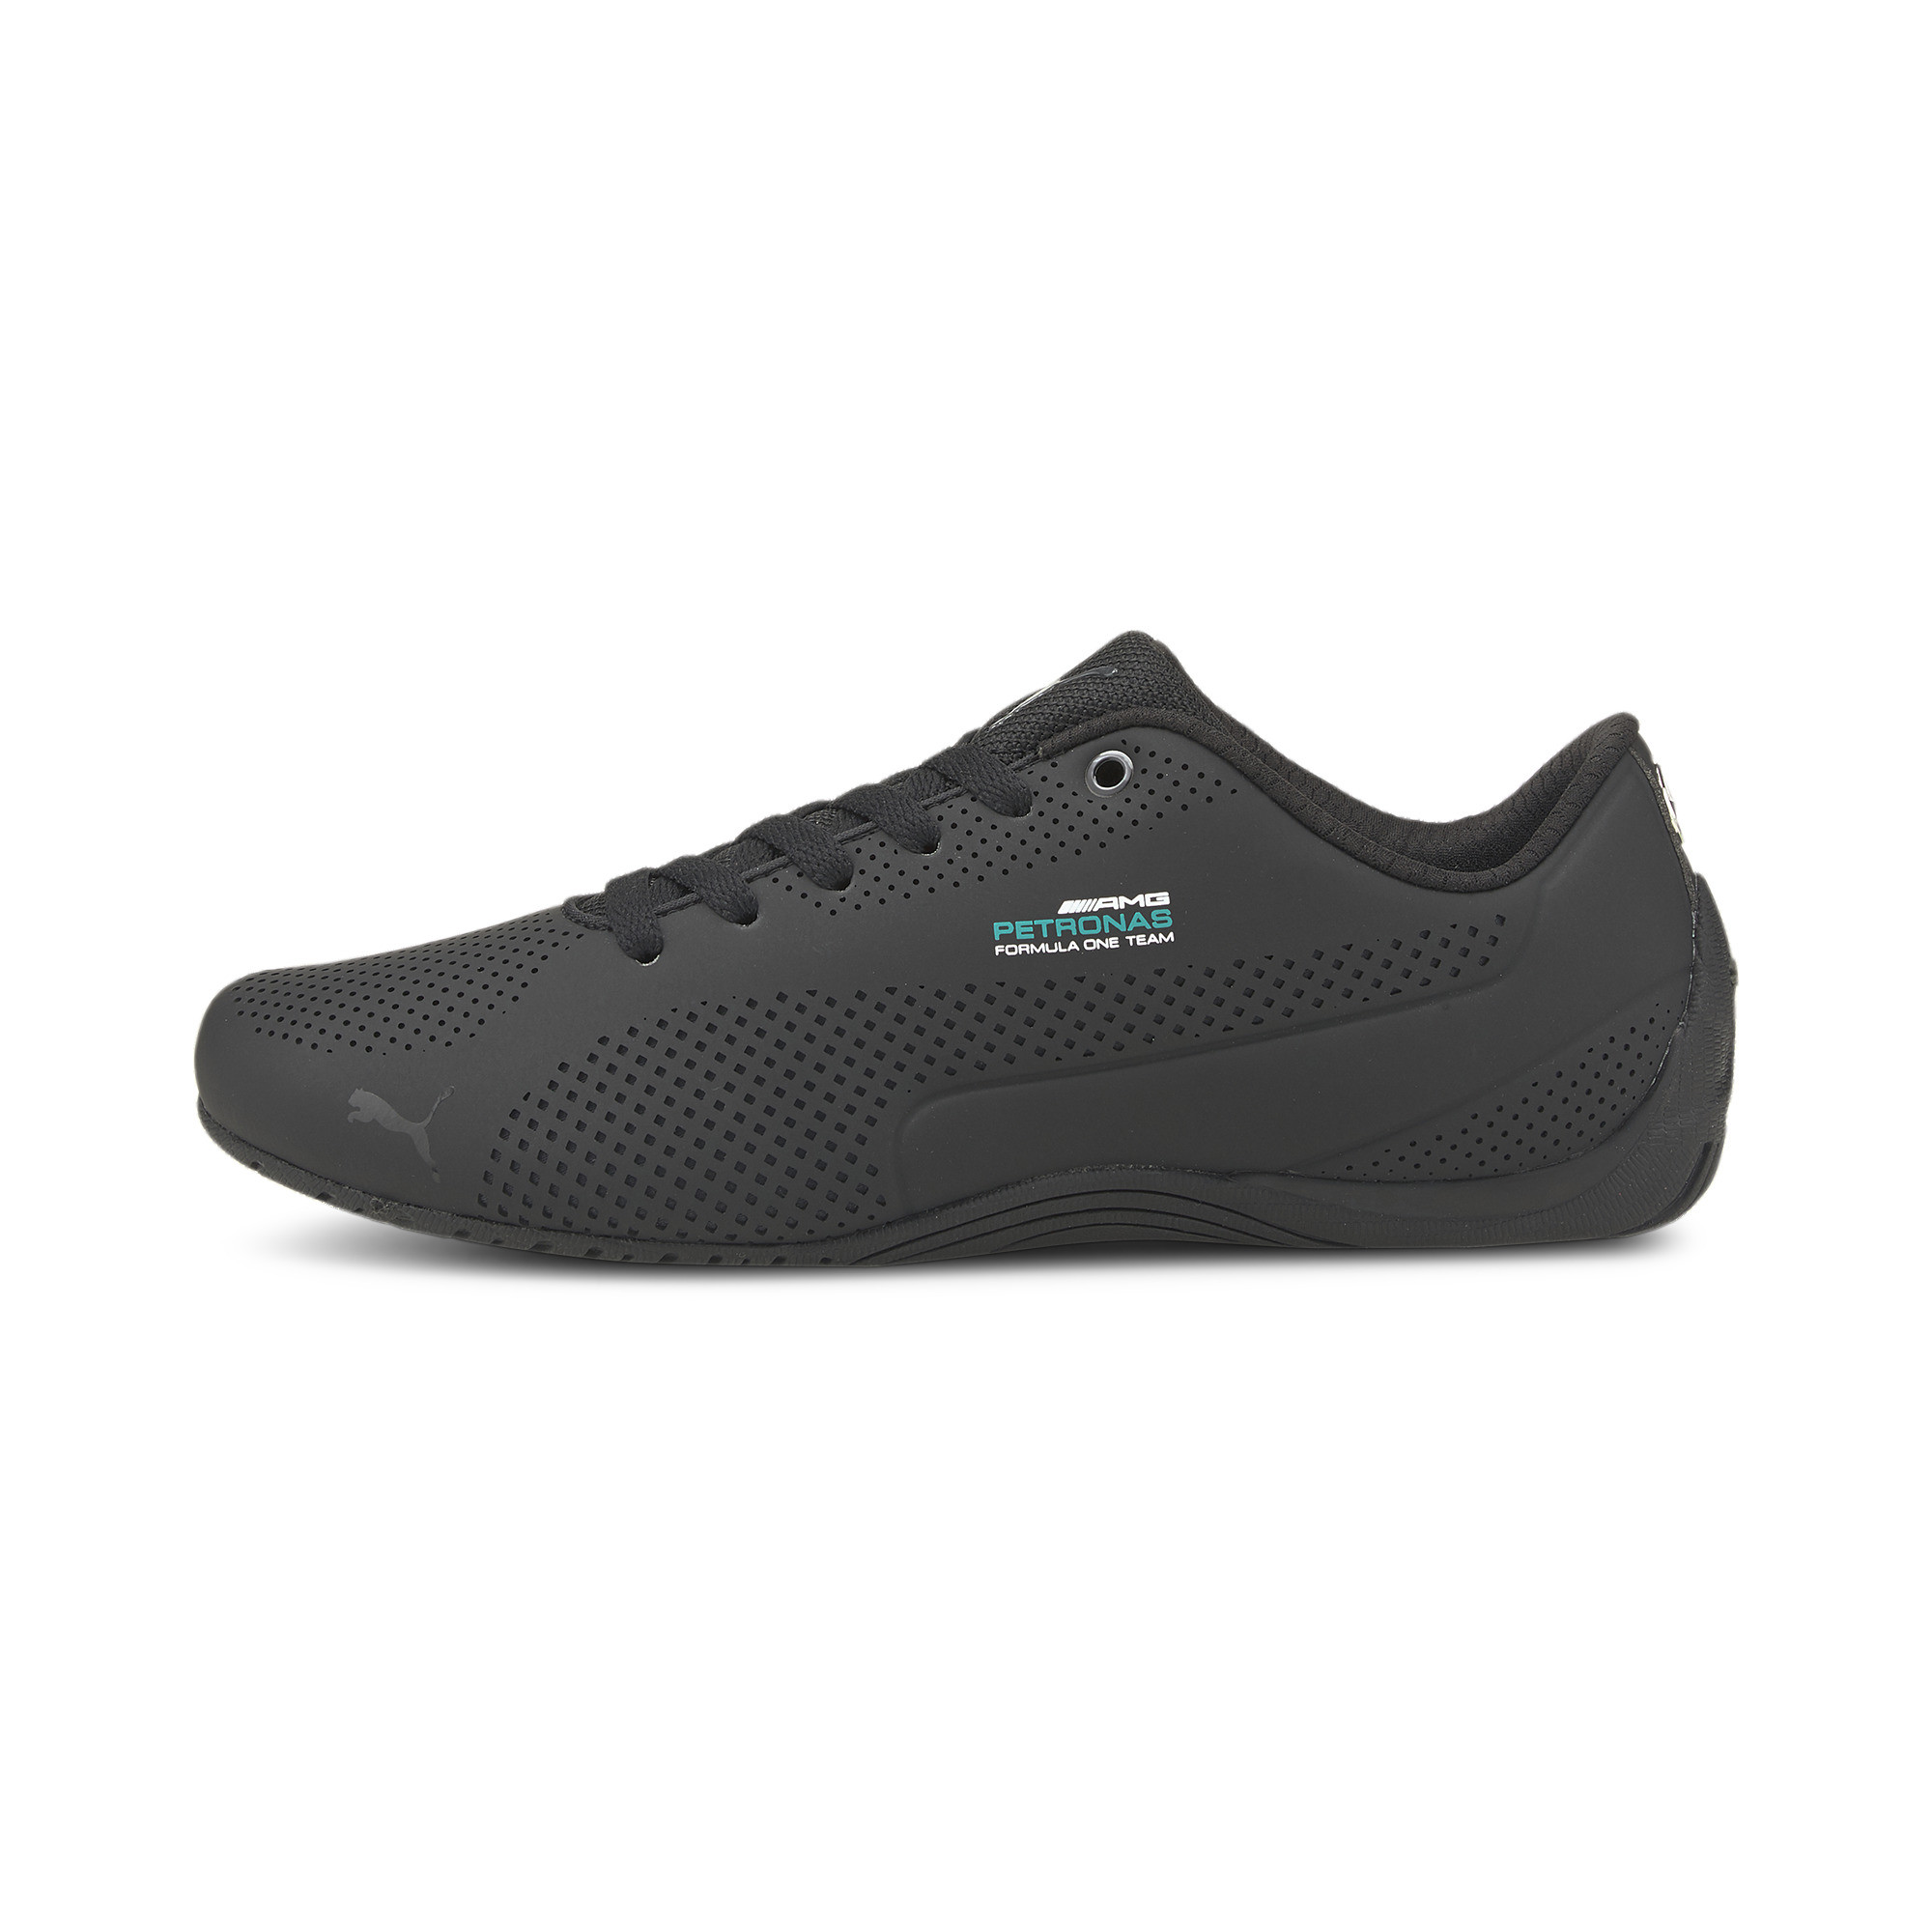 Indexbild 4 - PUMA MERCEDES AMG PETRONAS Drift Cat Ultra Sneaker Unisex Schuhe Neu